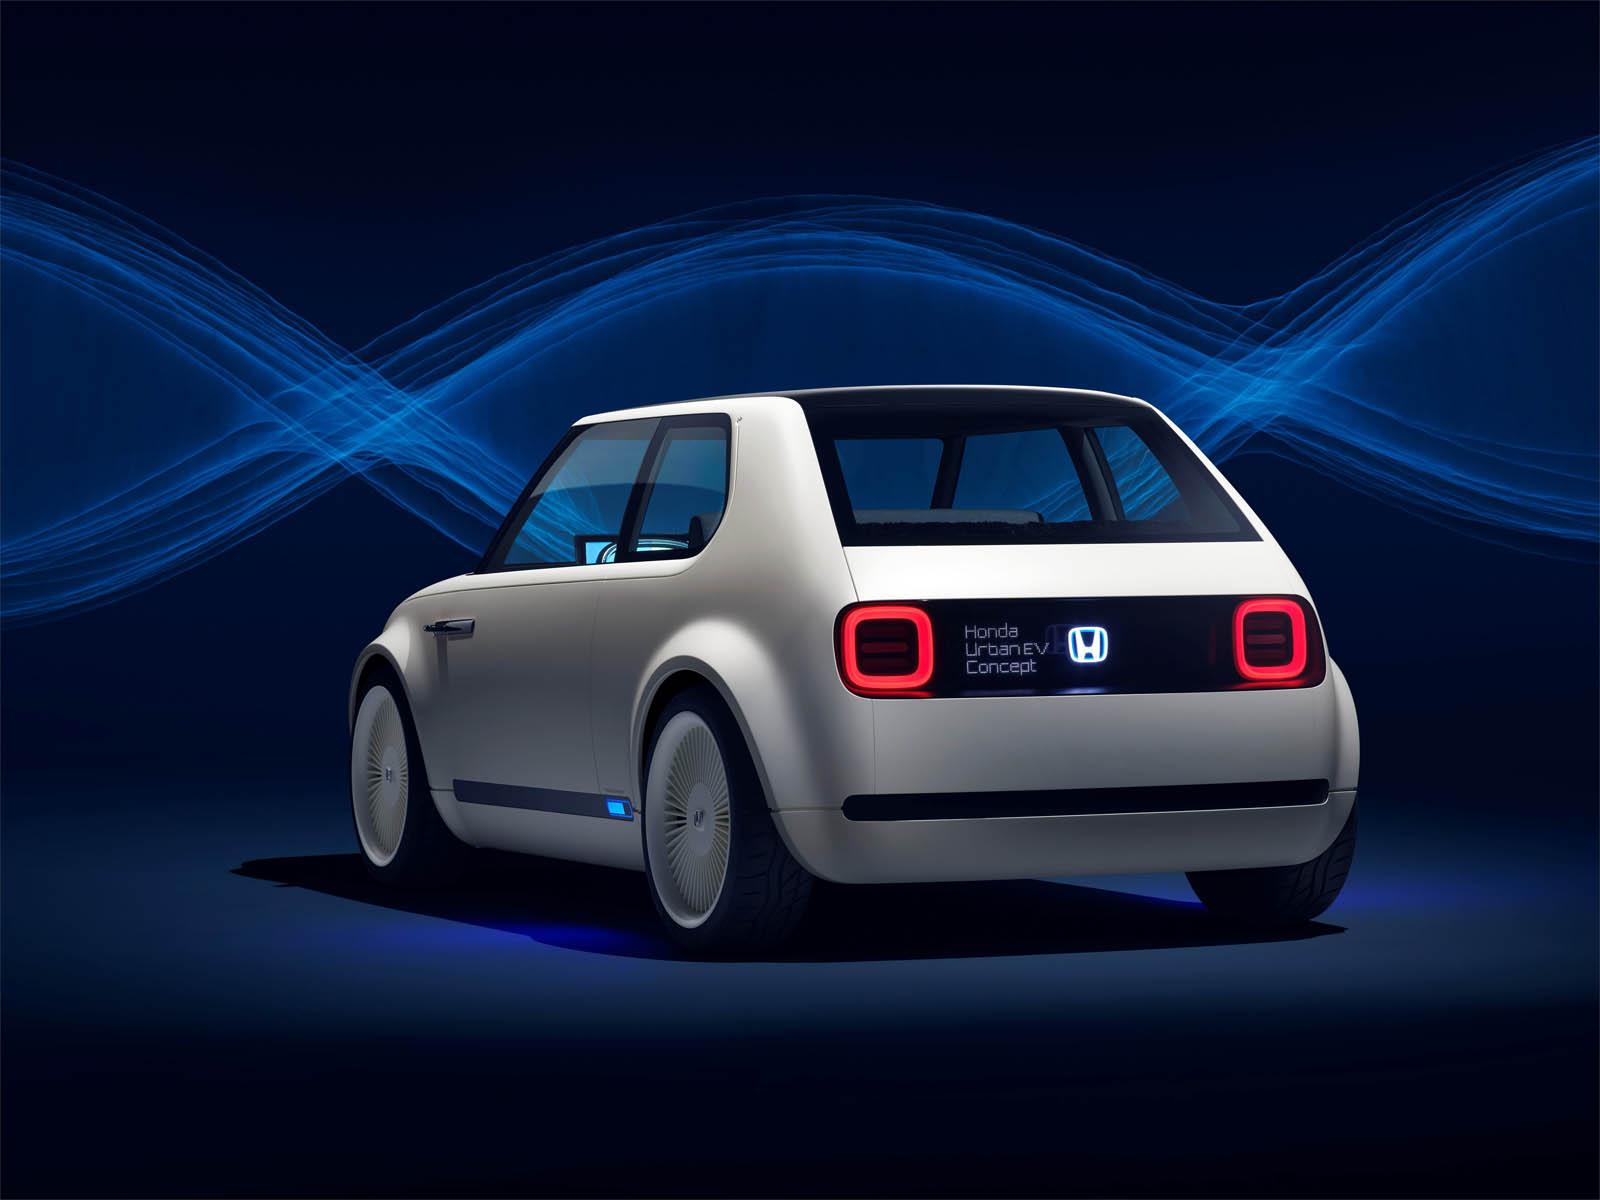 113873_Honda_Urban_EV_Concept_unveiled_at_the_Frankfurt_Motor_Show%2Bcopy.jpg